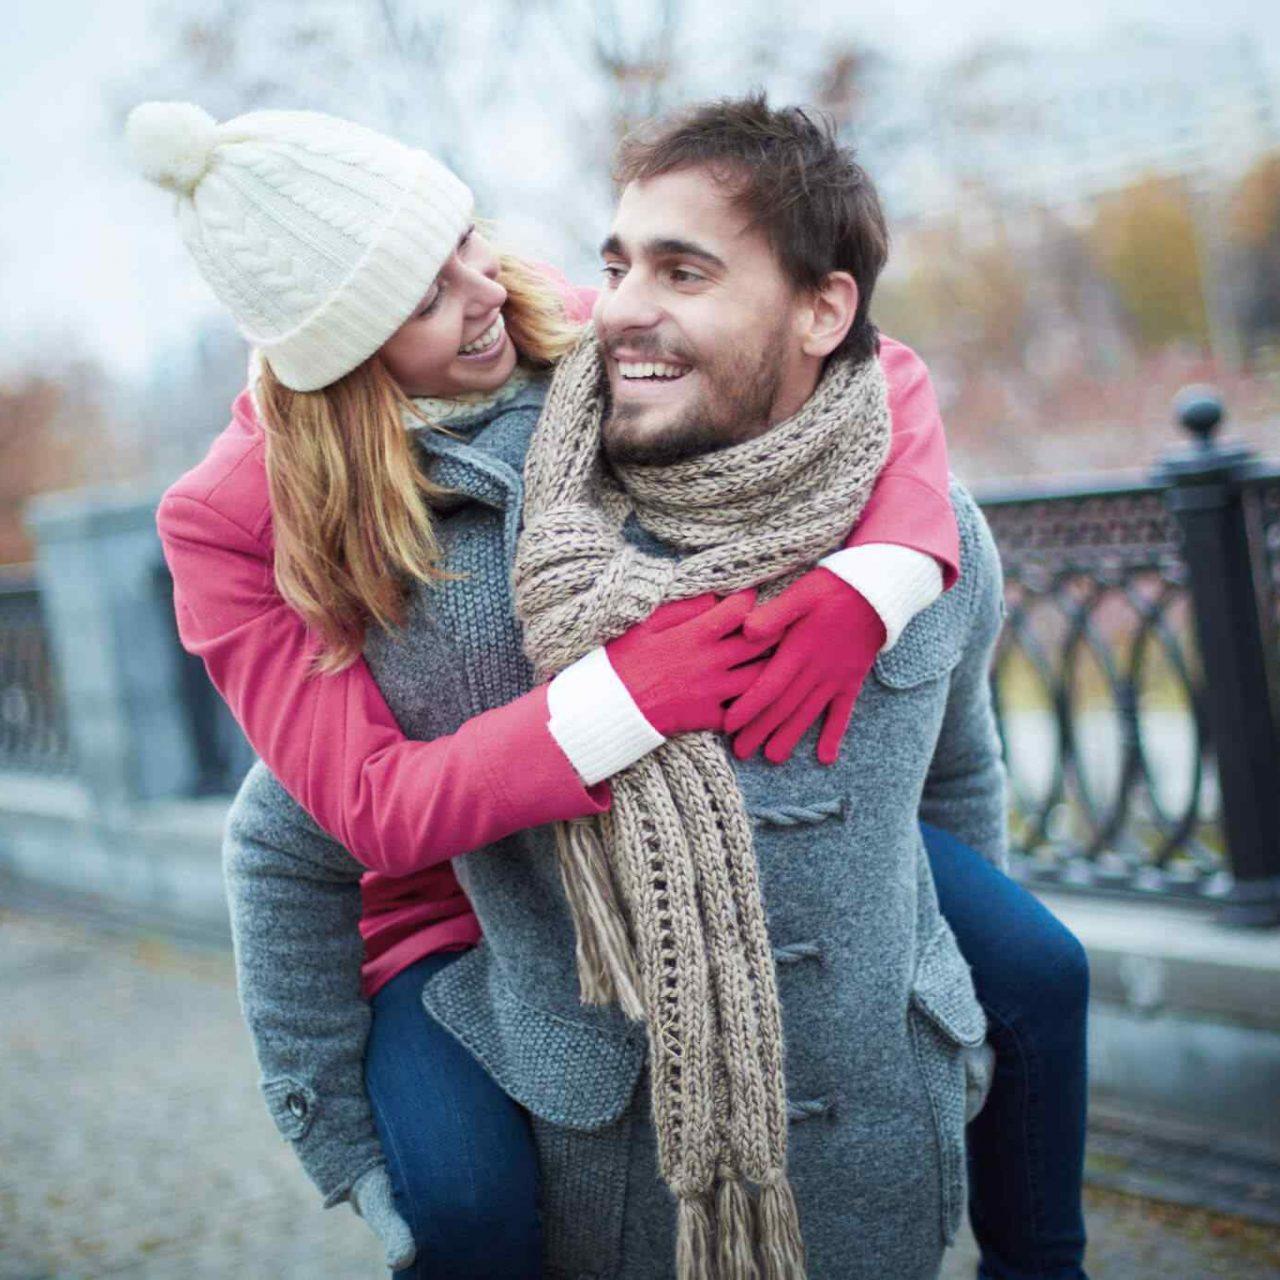 http://gotitasdepoliamor.com/wp-content/uploads/2018/01/img-event-marriage-01-1280x1280.jpg